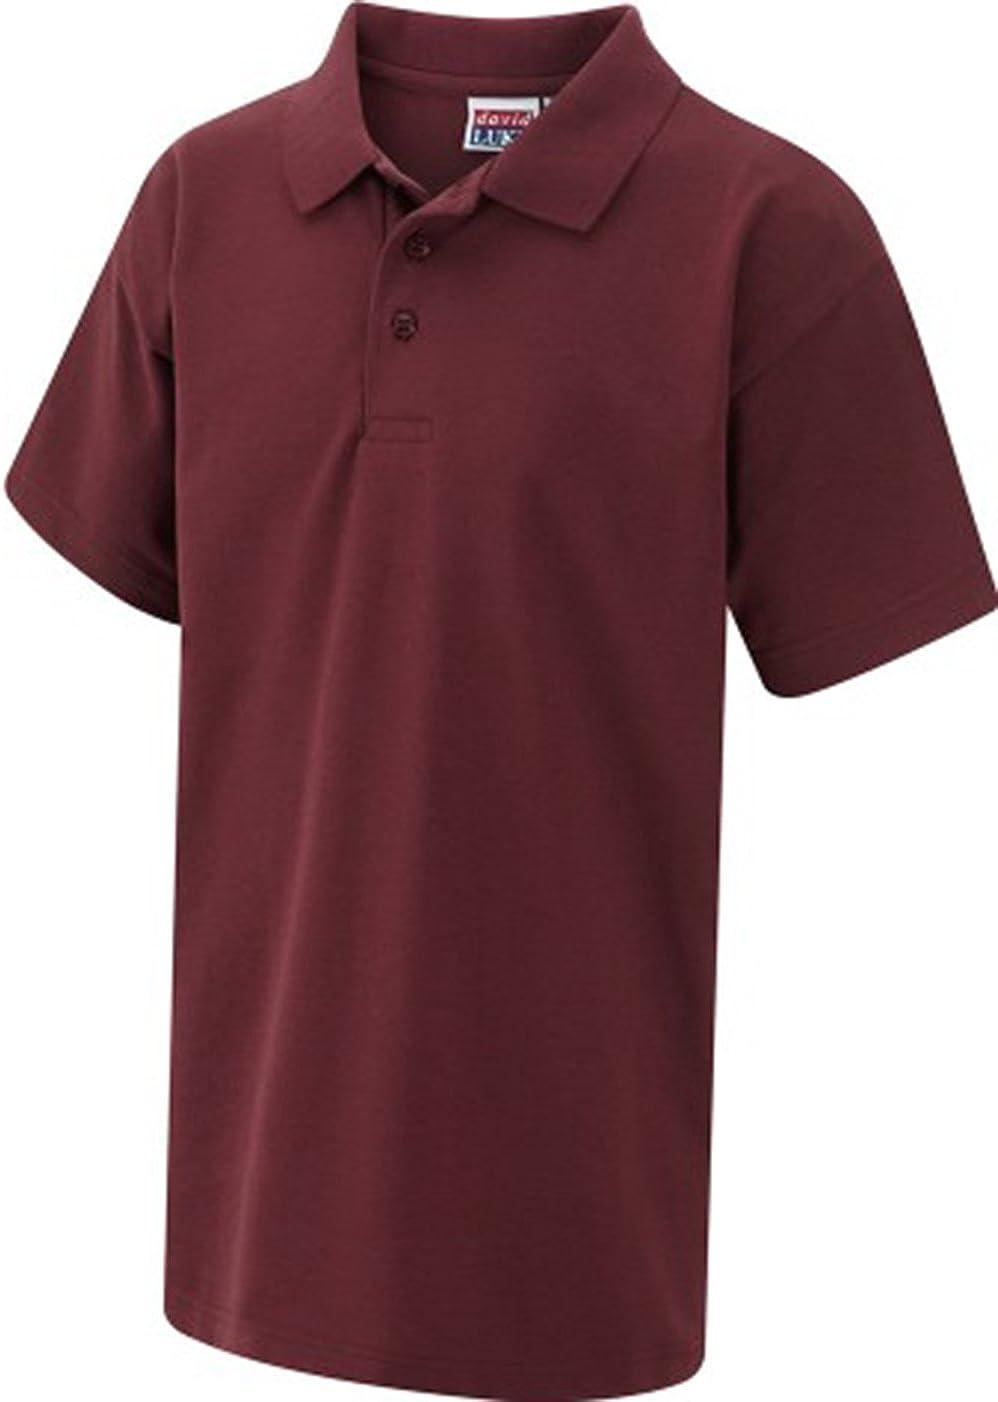 David Luke Childrens Schoolwear Unisex Kids School Uniform Shirt Classic Pique Poloshirt